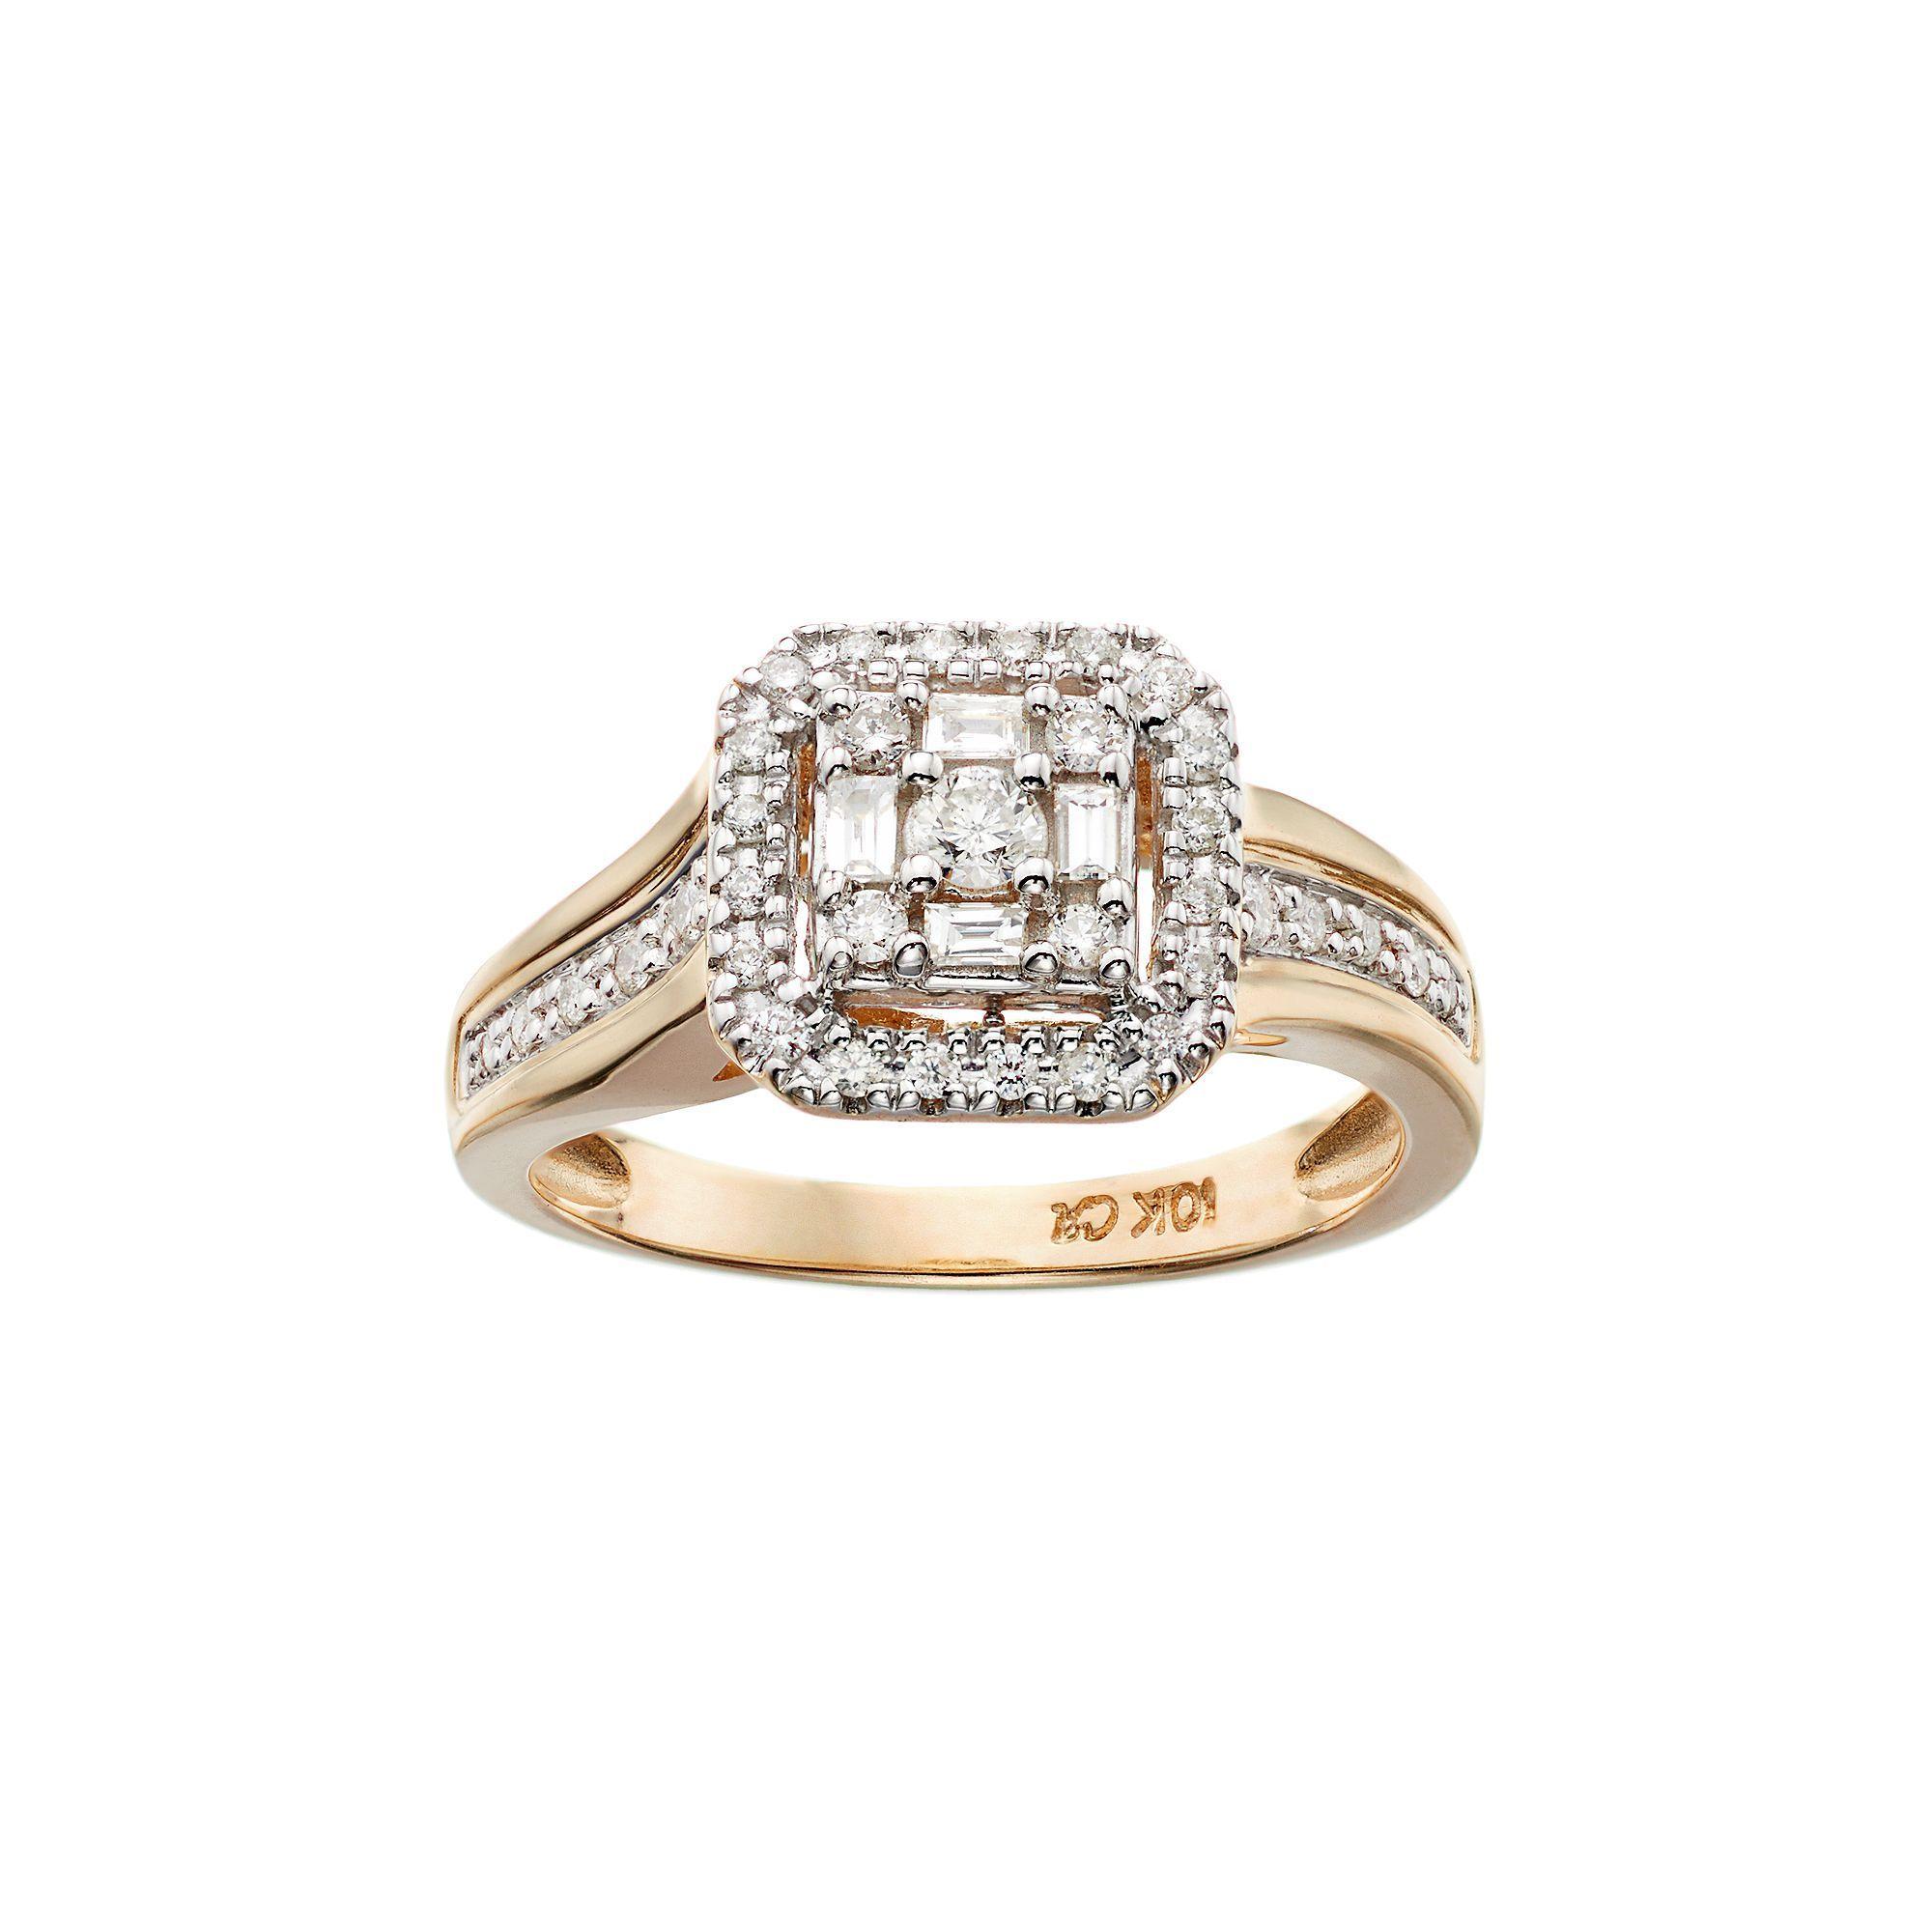 Cherish Always 10k Gold 1 3 Carat T W Certified Diamond Halo Engagement Ring Women S Size 7 Whi Halo Diamond Engagement Ring Halo Diamond White Gold Rings